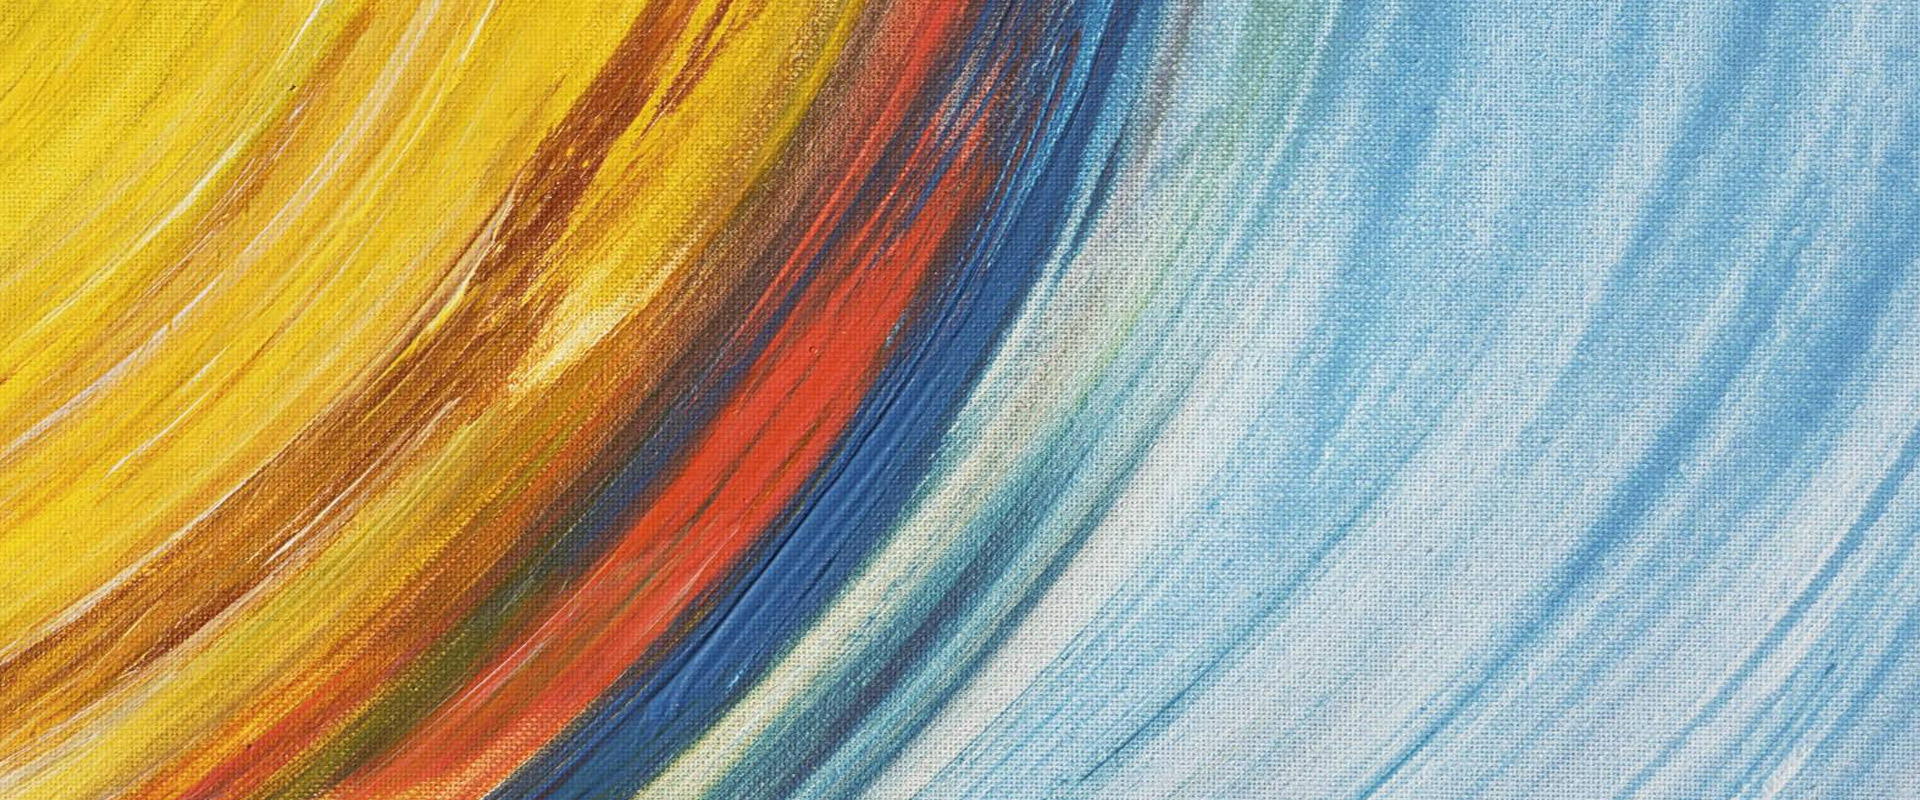 Patrón Diseño Fondos De Pantalla Textura Antecedentes: Textura Patrón Diseño Tela Antecedentes Color Textured